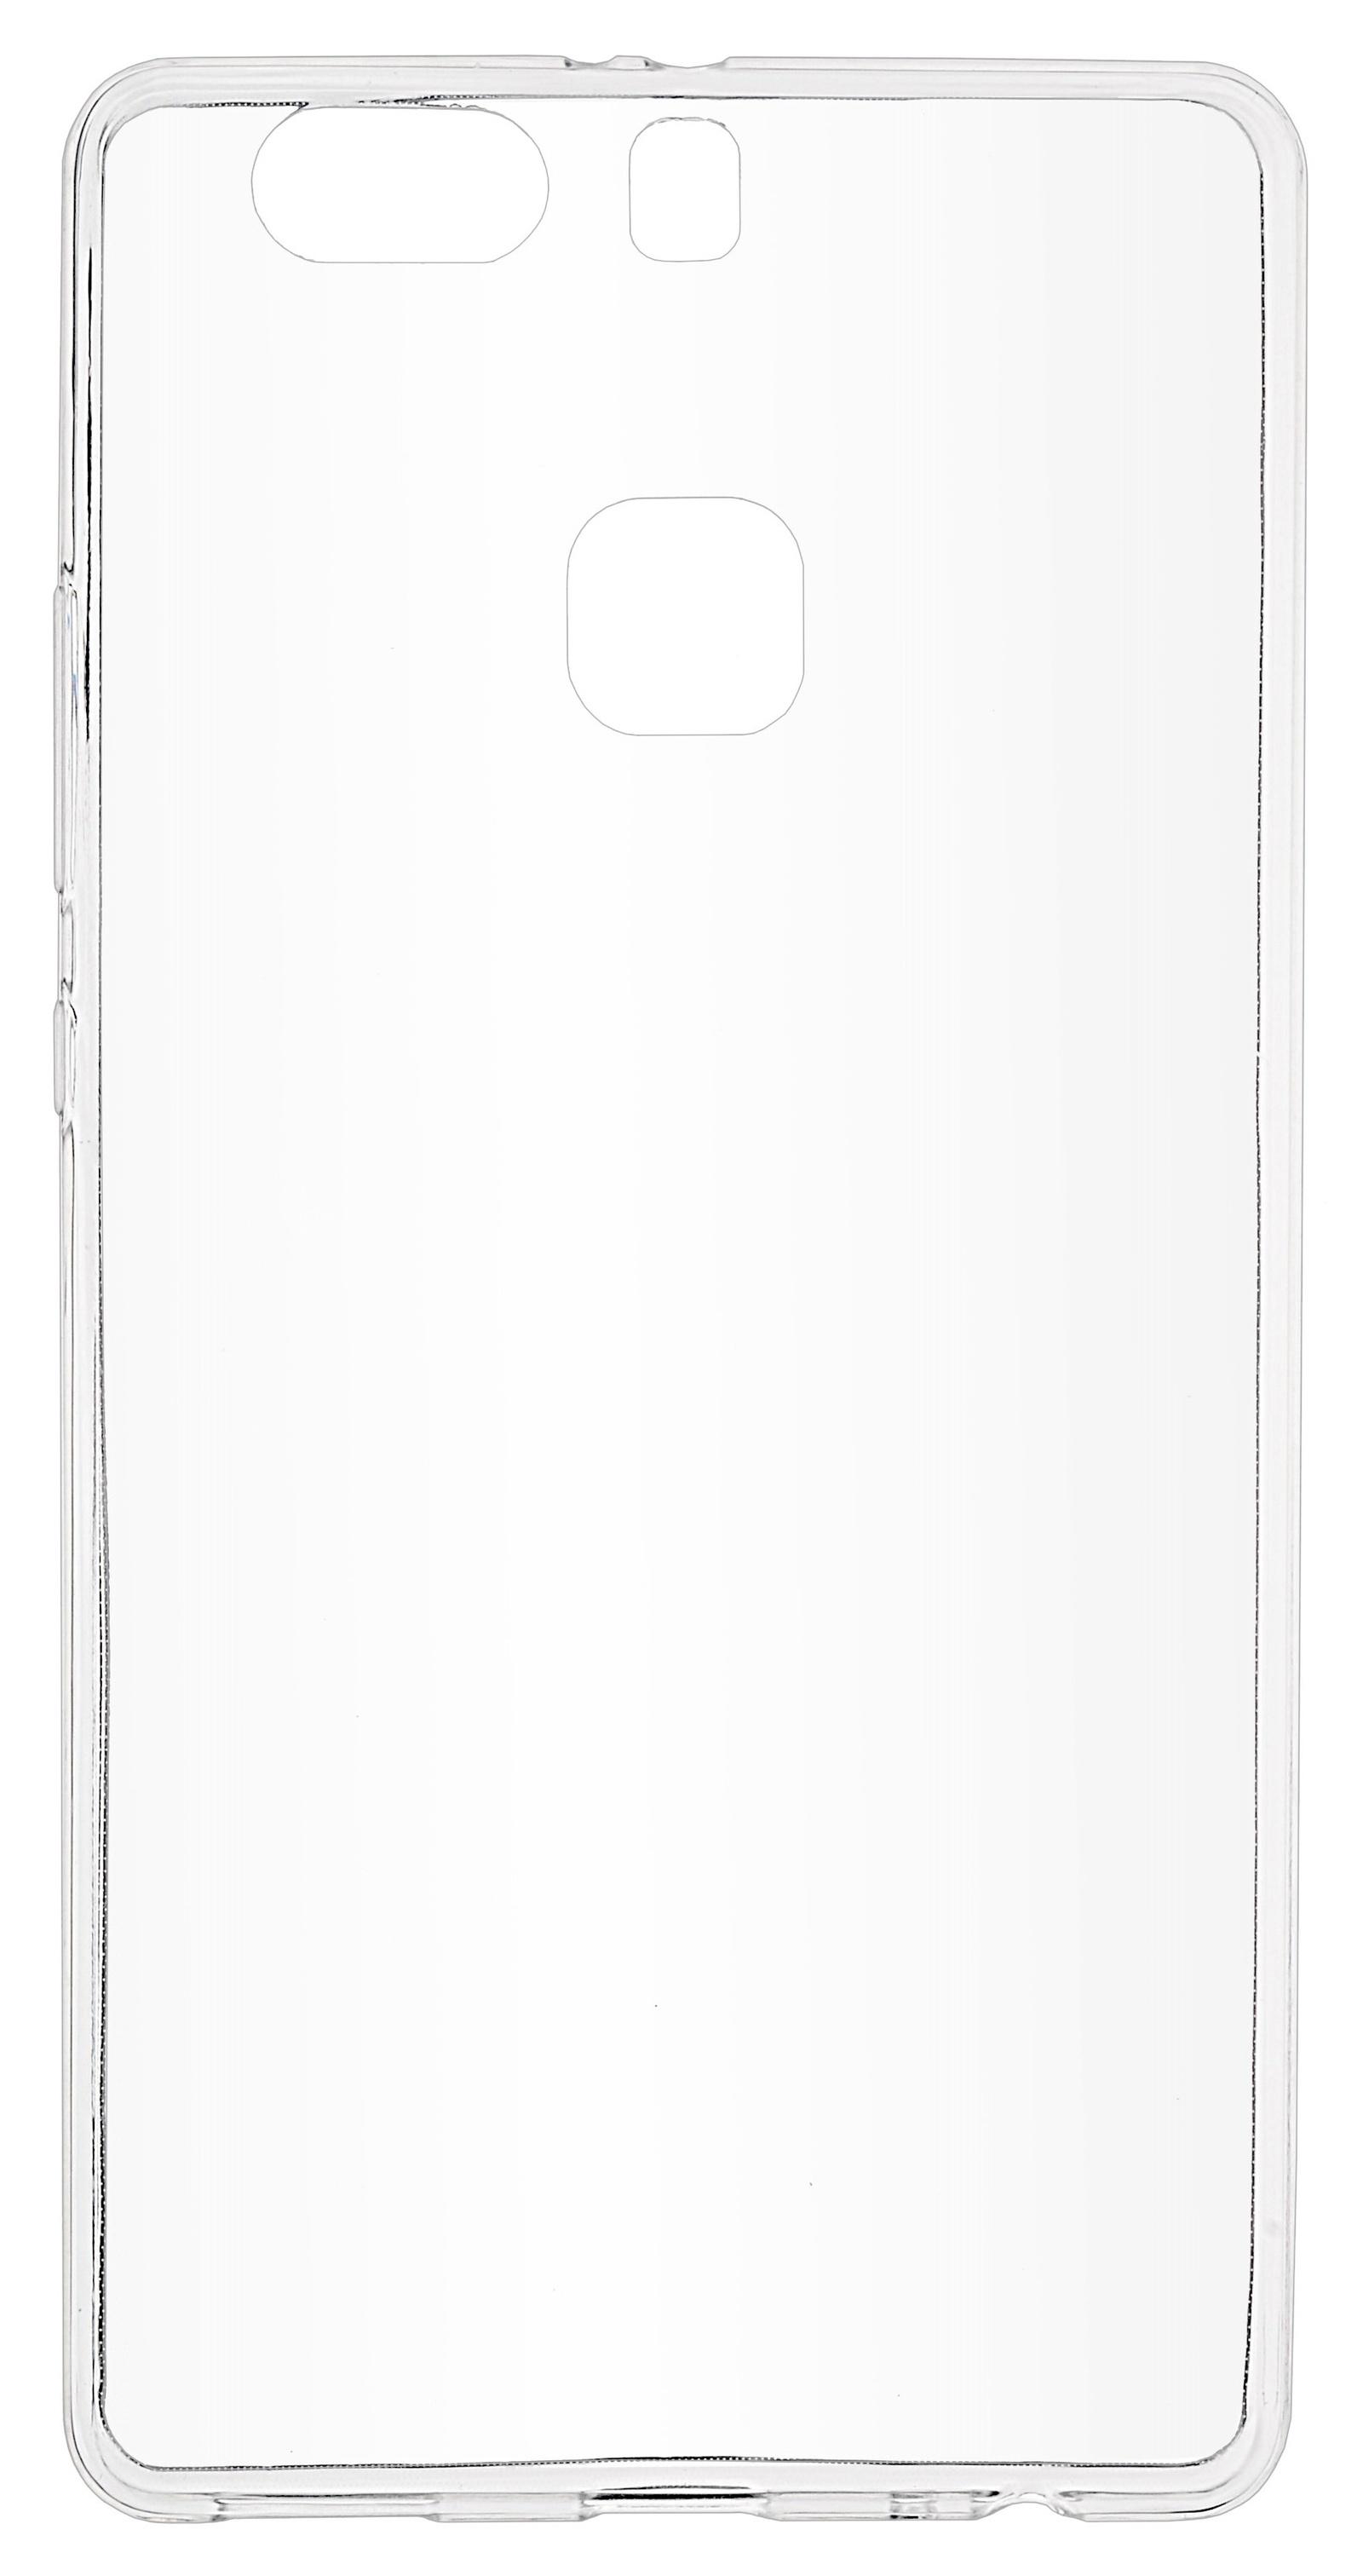 Чехол для сотового телефона skinBOX Slim Silicone, 4630042528888, прозрачный цена и фото